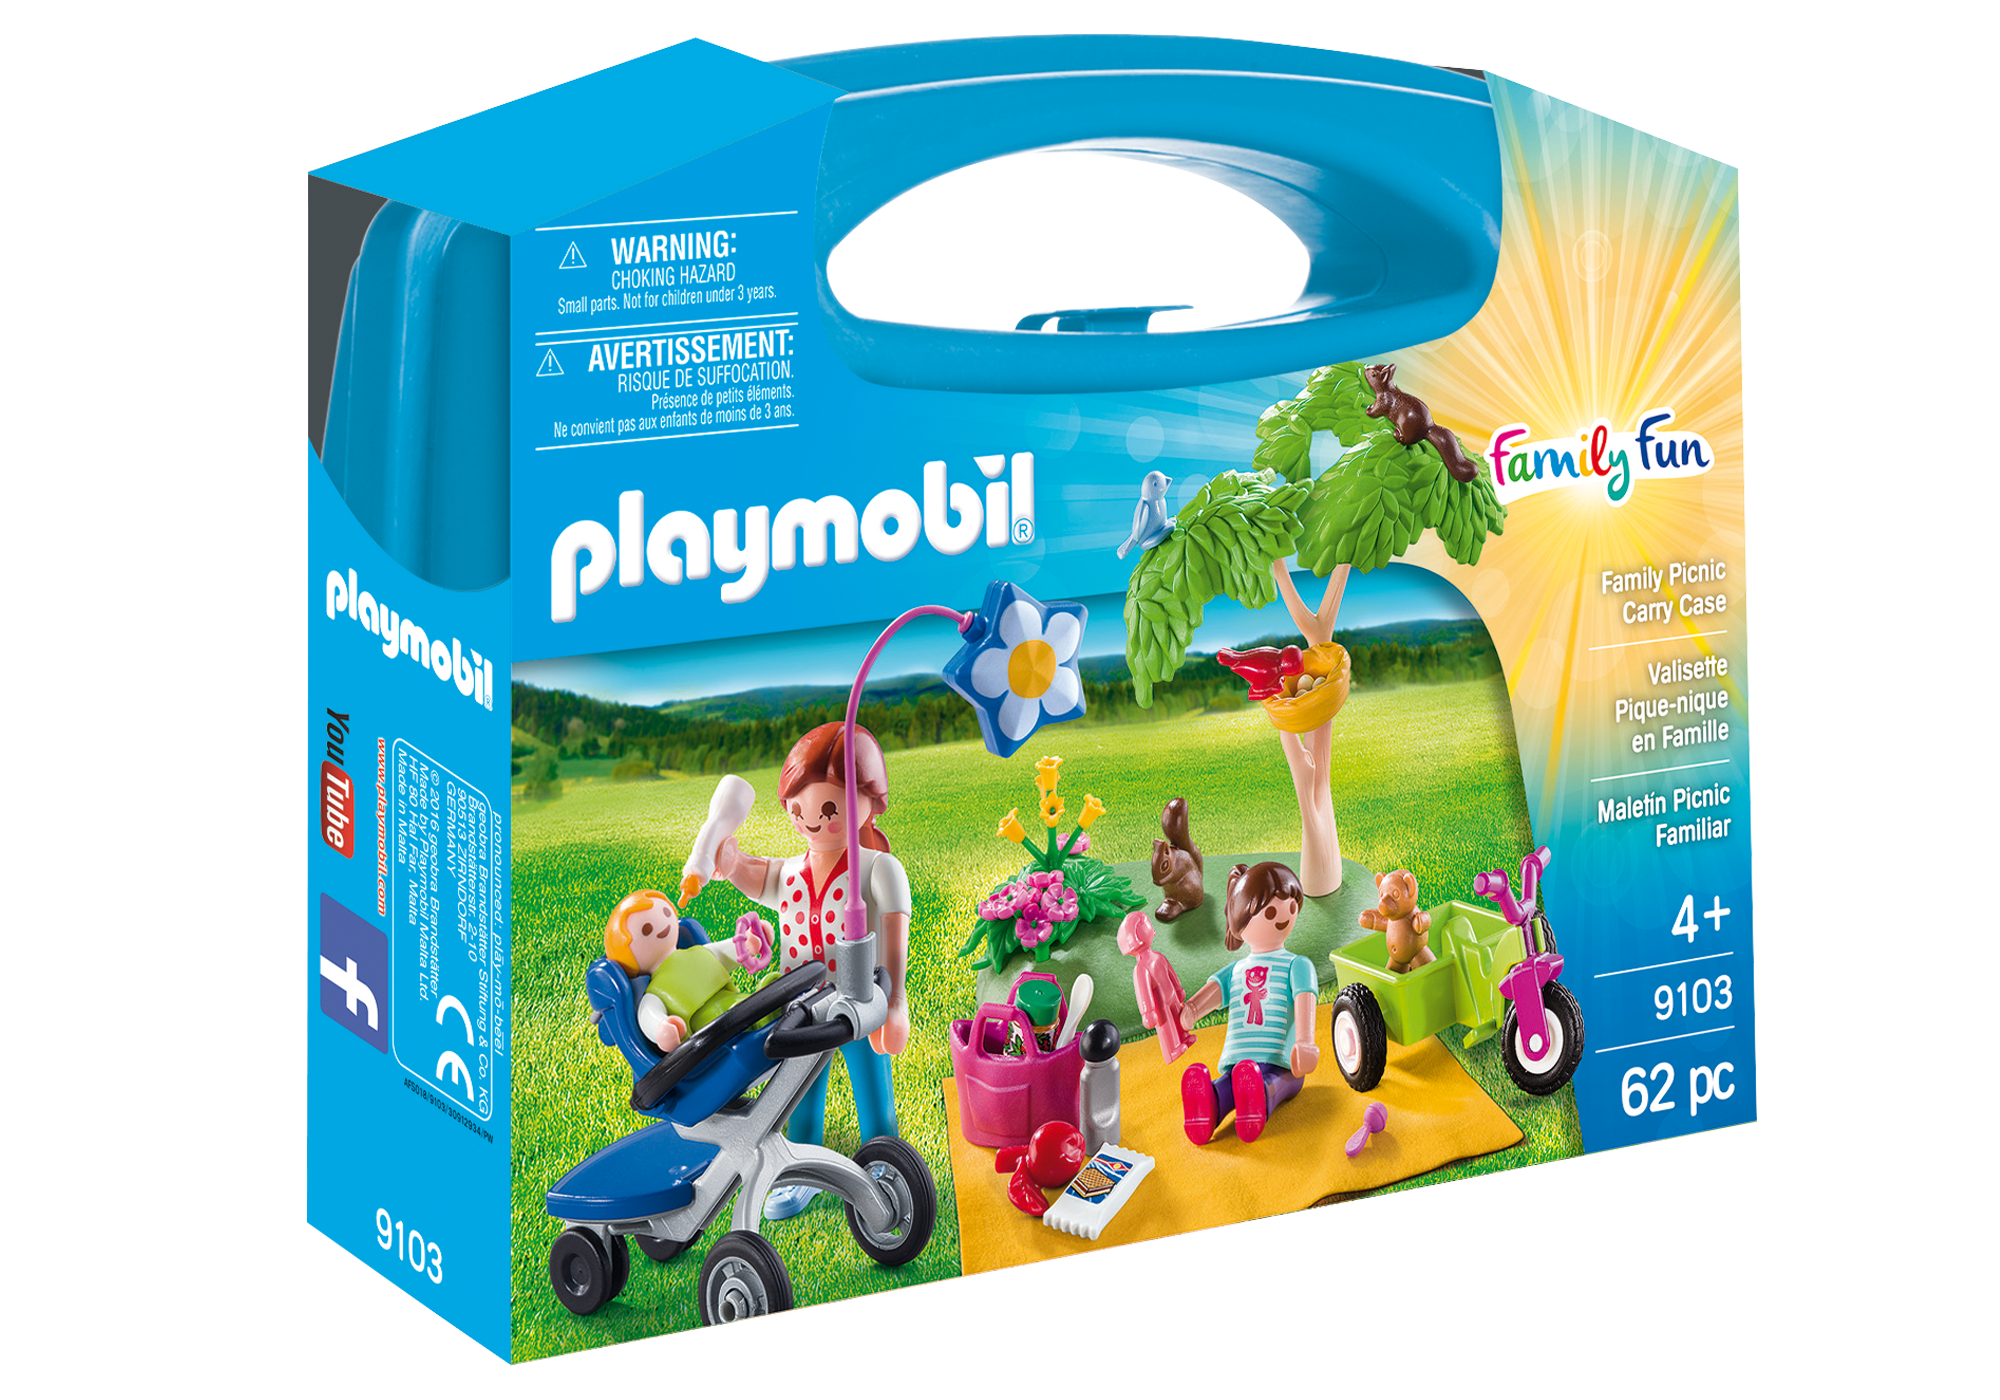 http://media.playmobil.com/i/playmobil/9103_product_box_front/Valisette Pique-nique en Famille